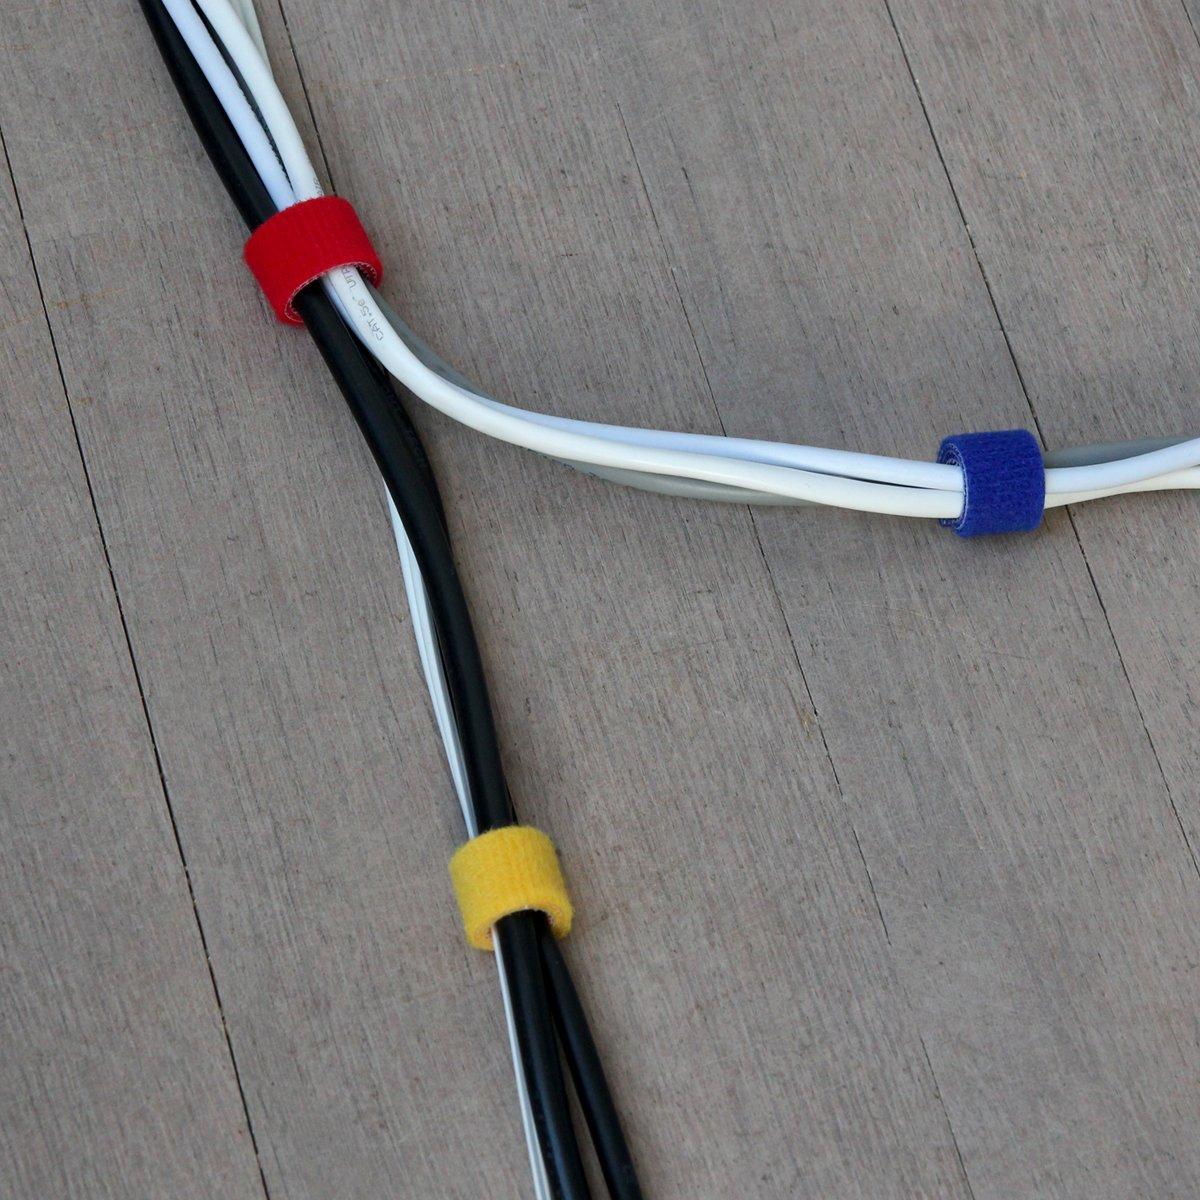 Label-the-cable Klettbandrollen doppelseitig (Haken & Flausch ...